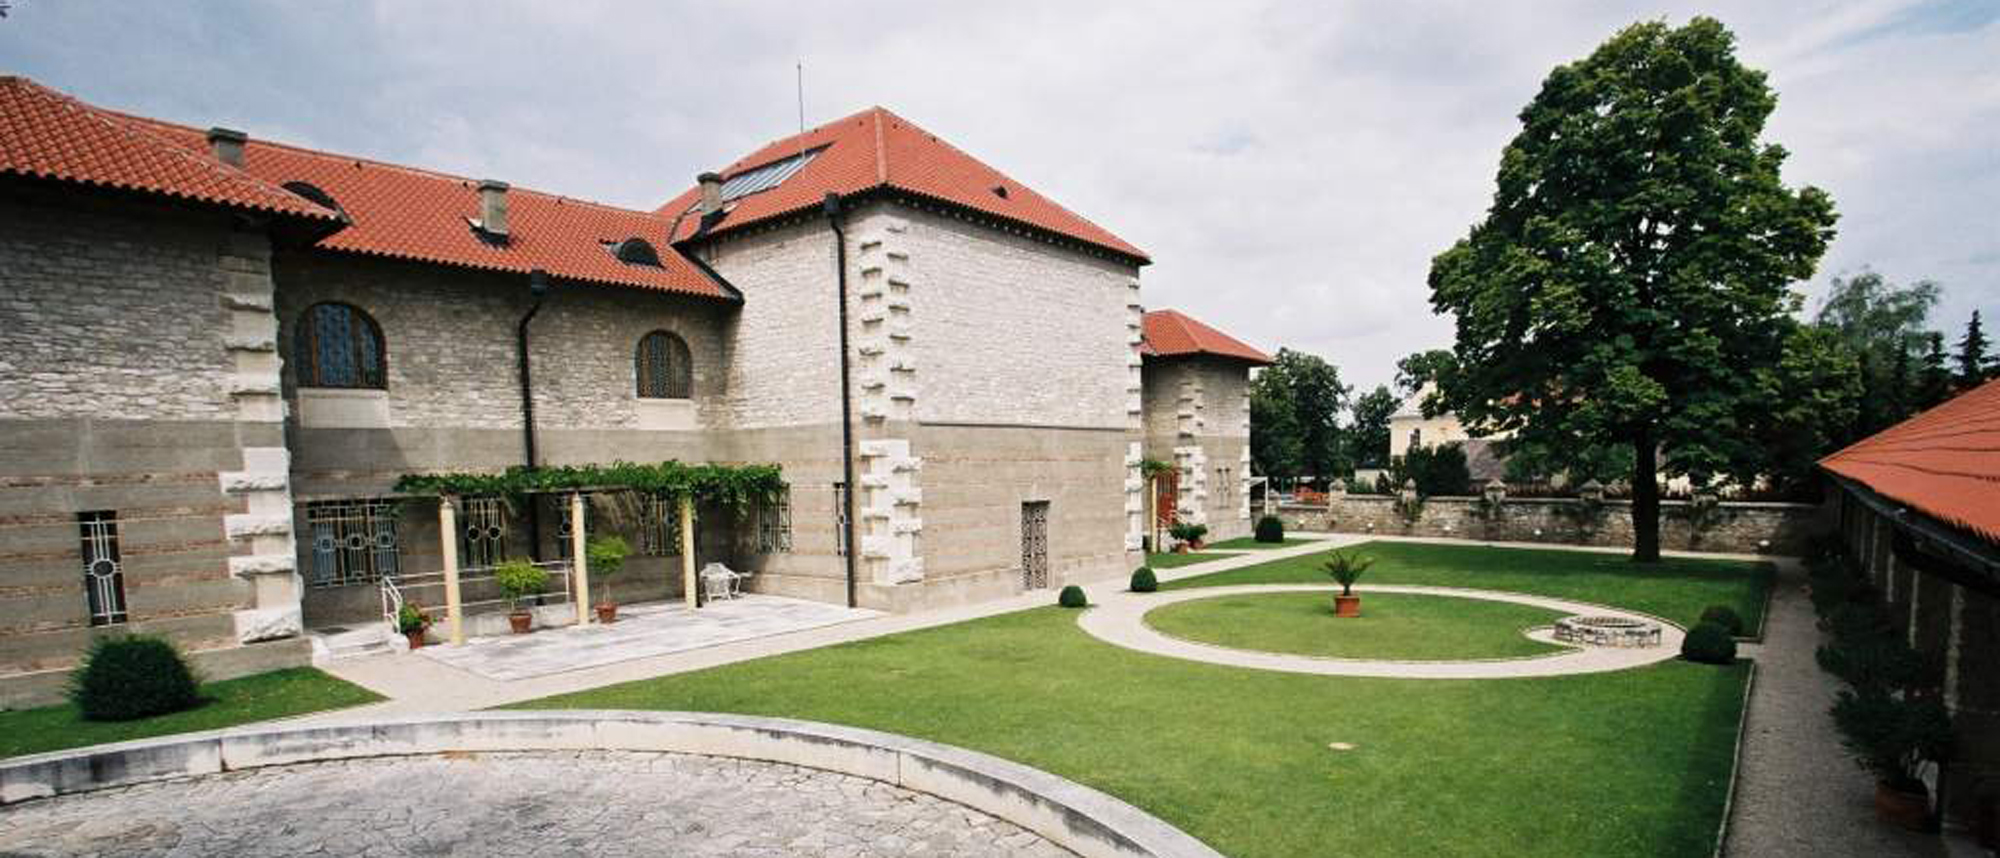 Ausstellungsstandort Museum Carnuntinum © AKP